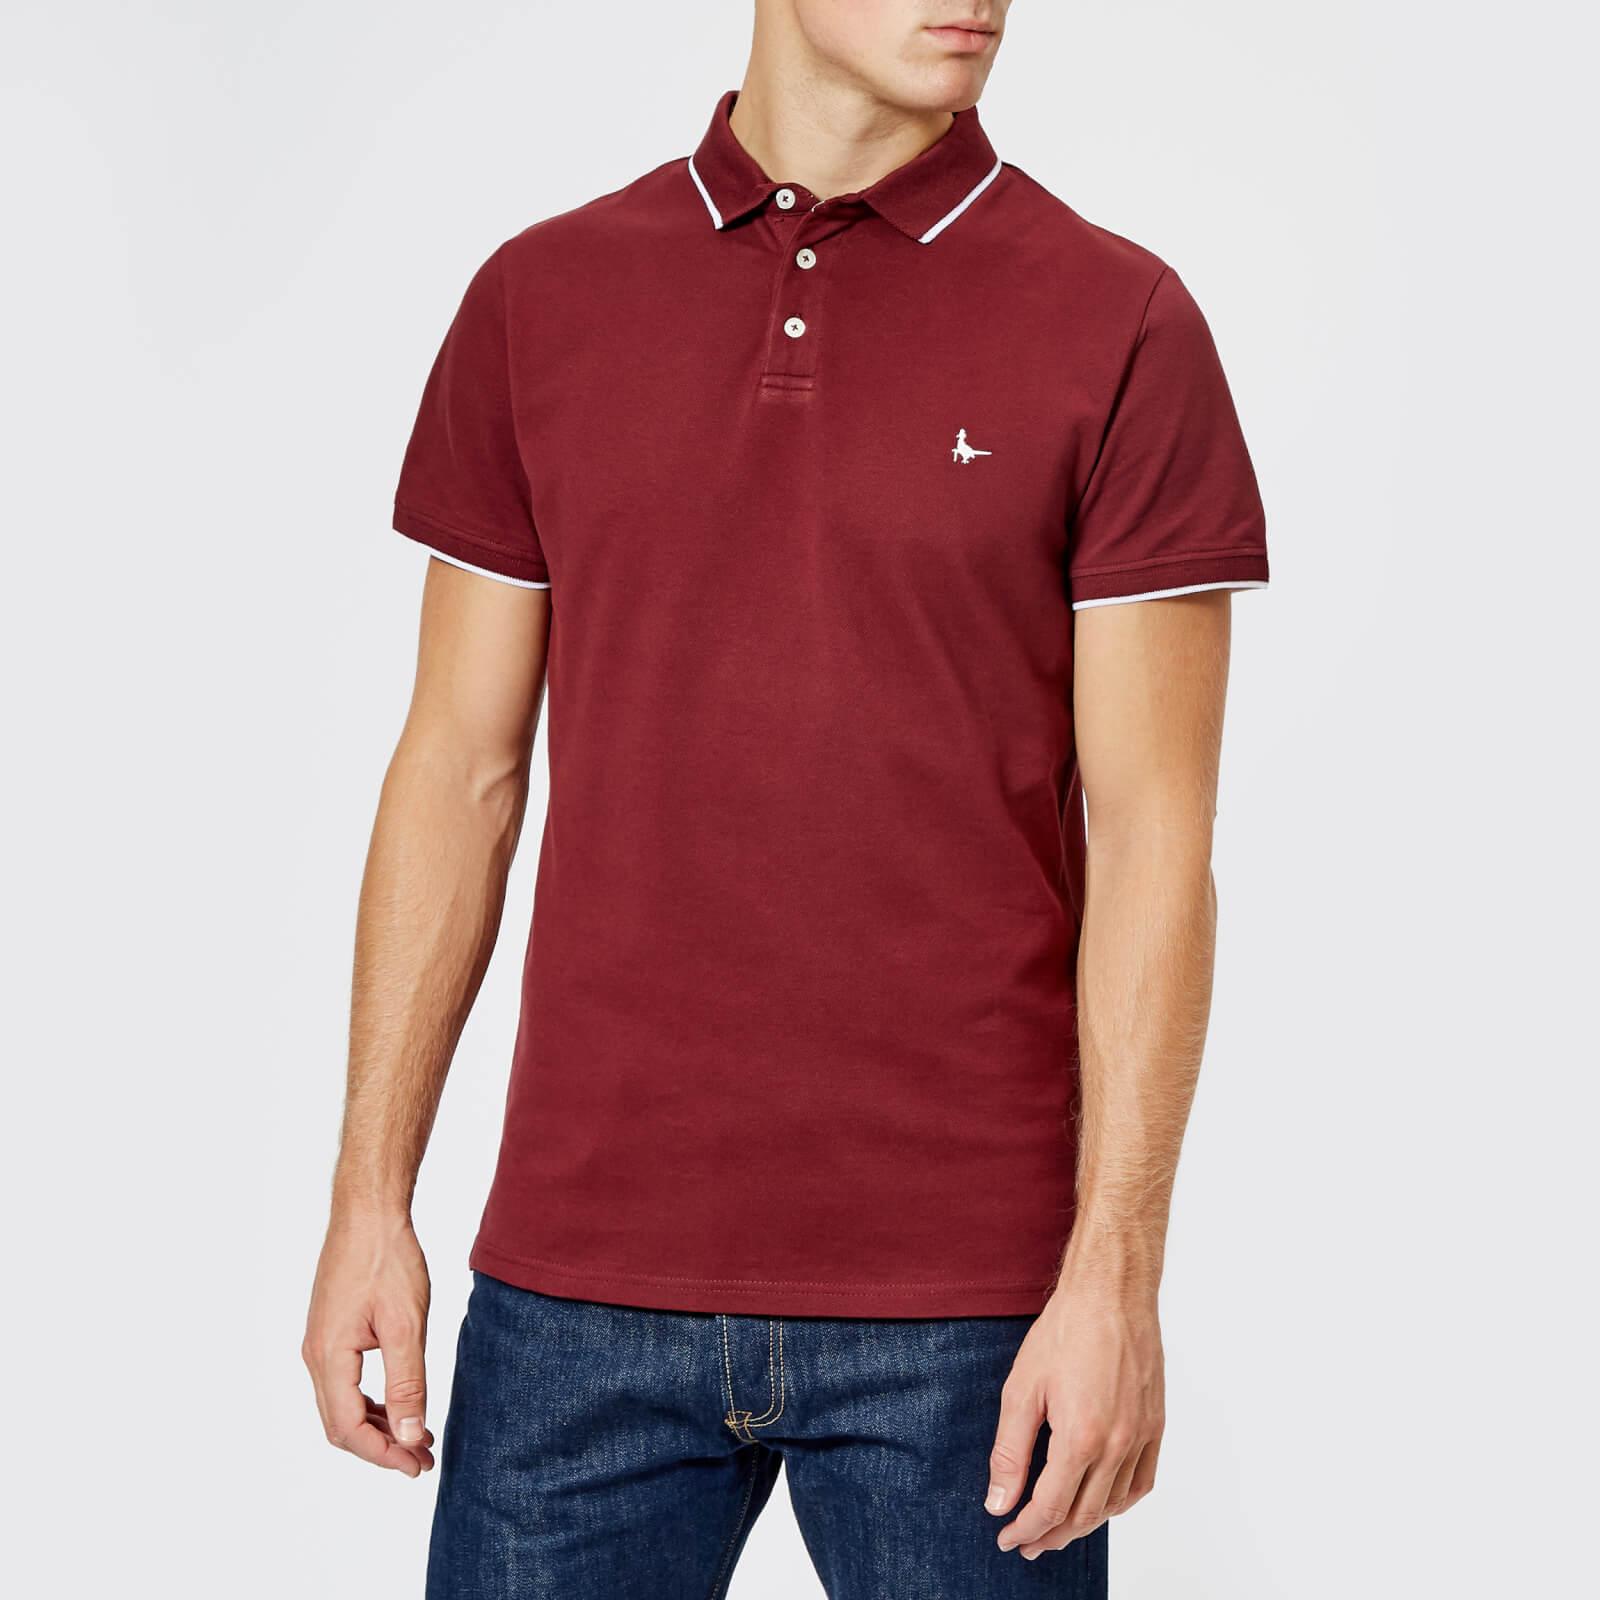 5a4d68958a9 Jack Wills Men's New Classic Polo Shirt - Damson Clothing   TheHut.com